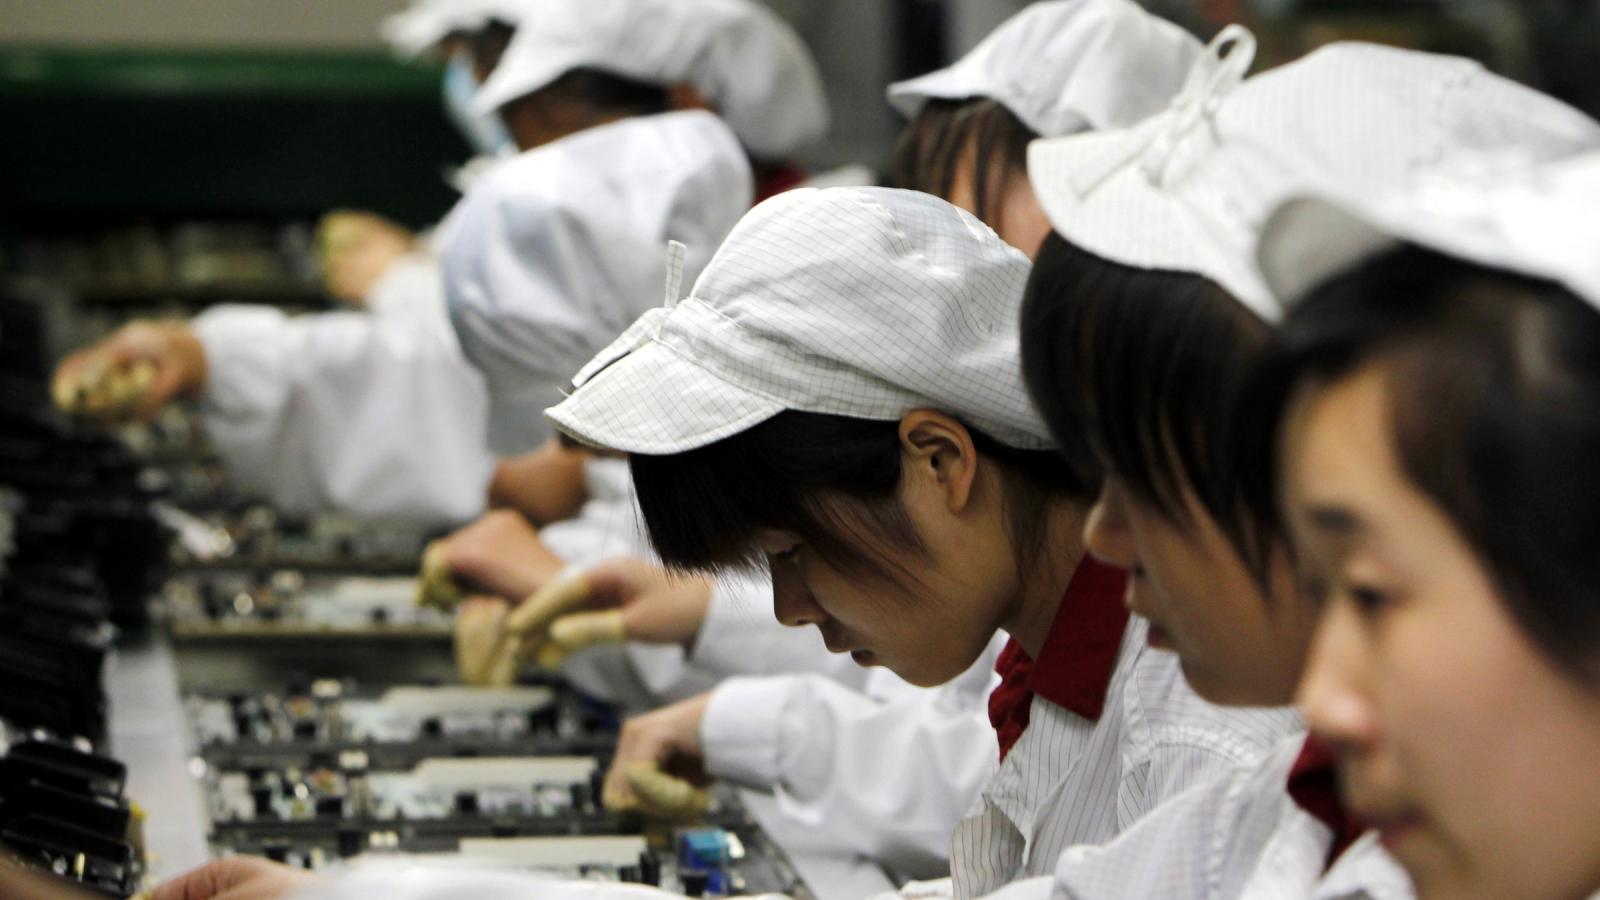 foxconn workers 030614 اپل به عدم قطع همکاری با تأمین کنندگان ناقض قوانین کار متهم شد اخبار IT